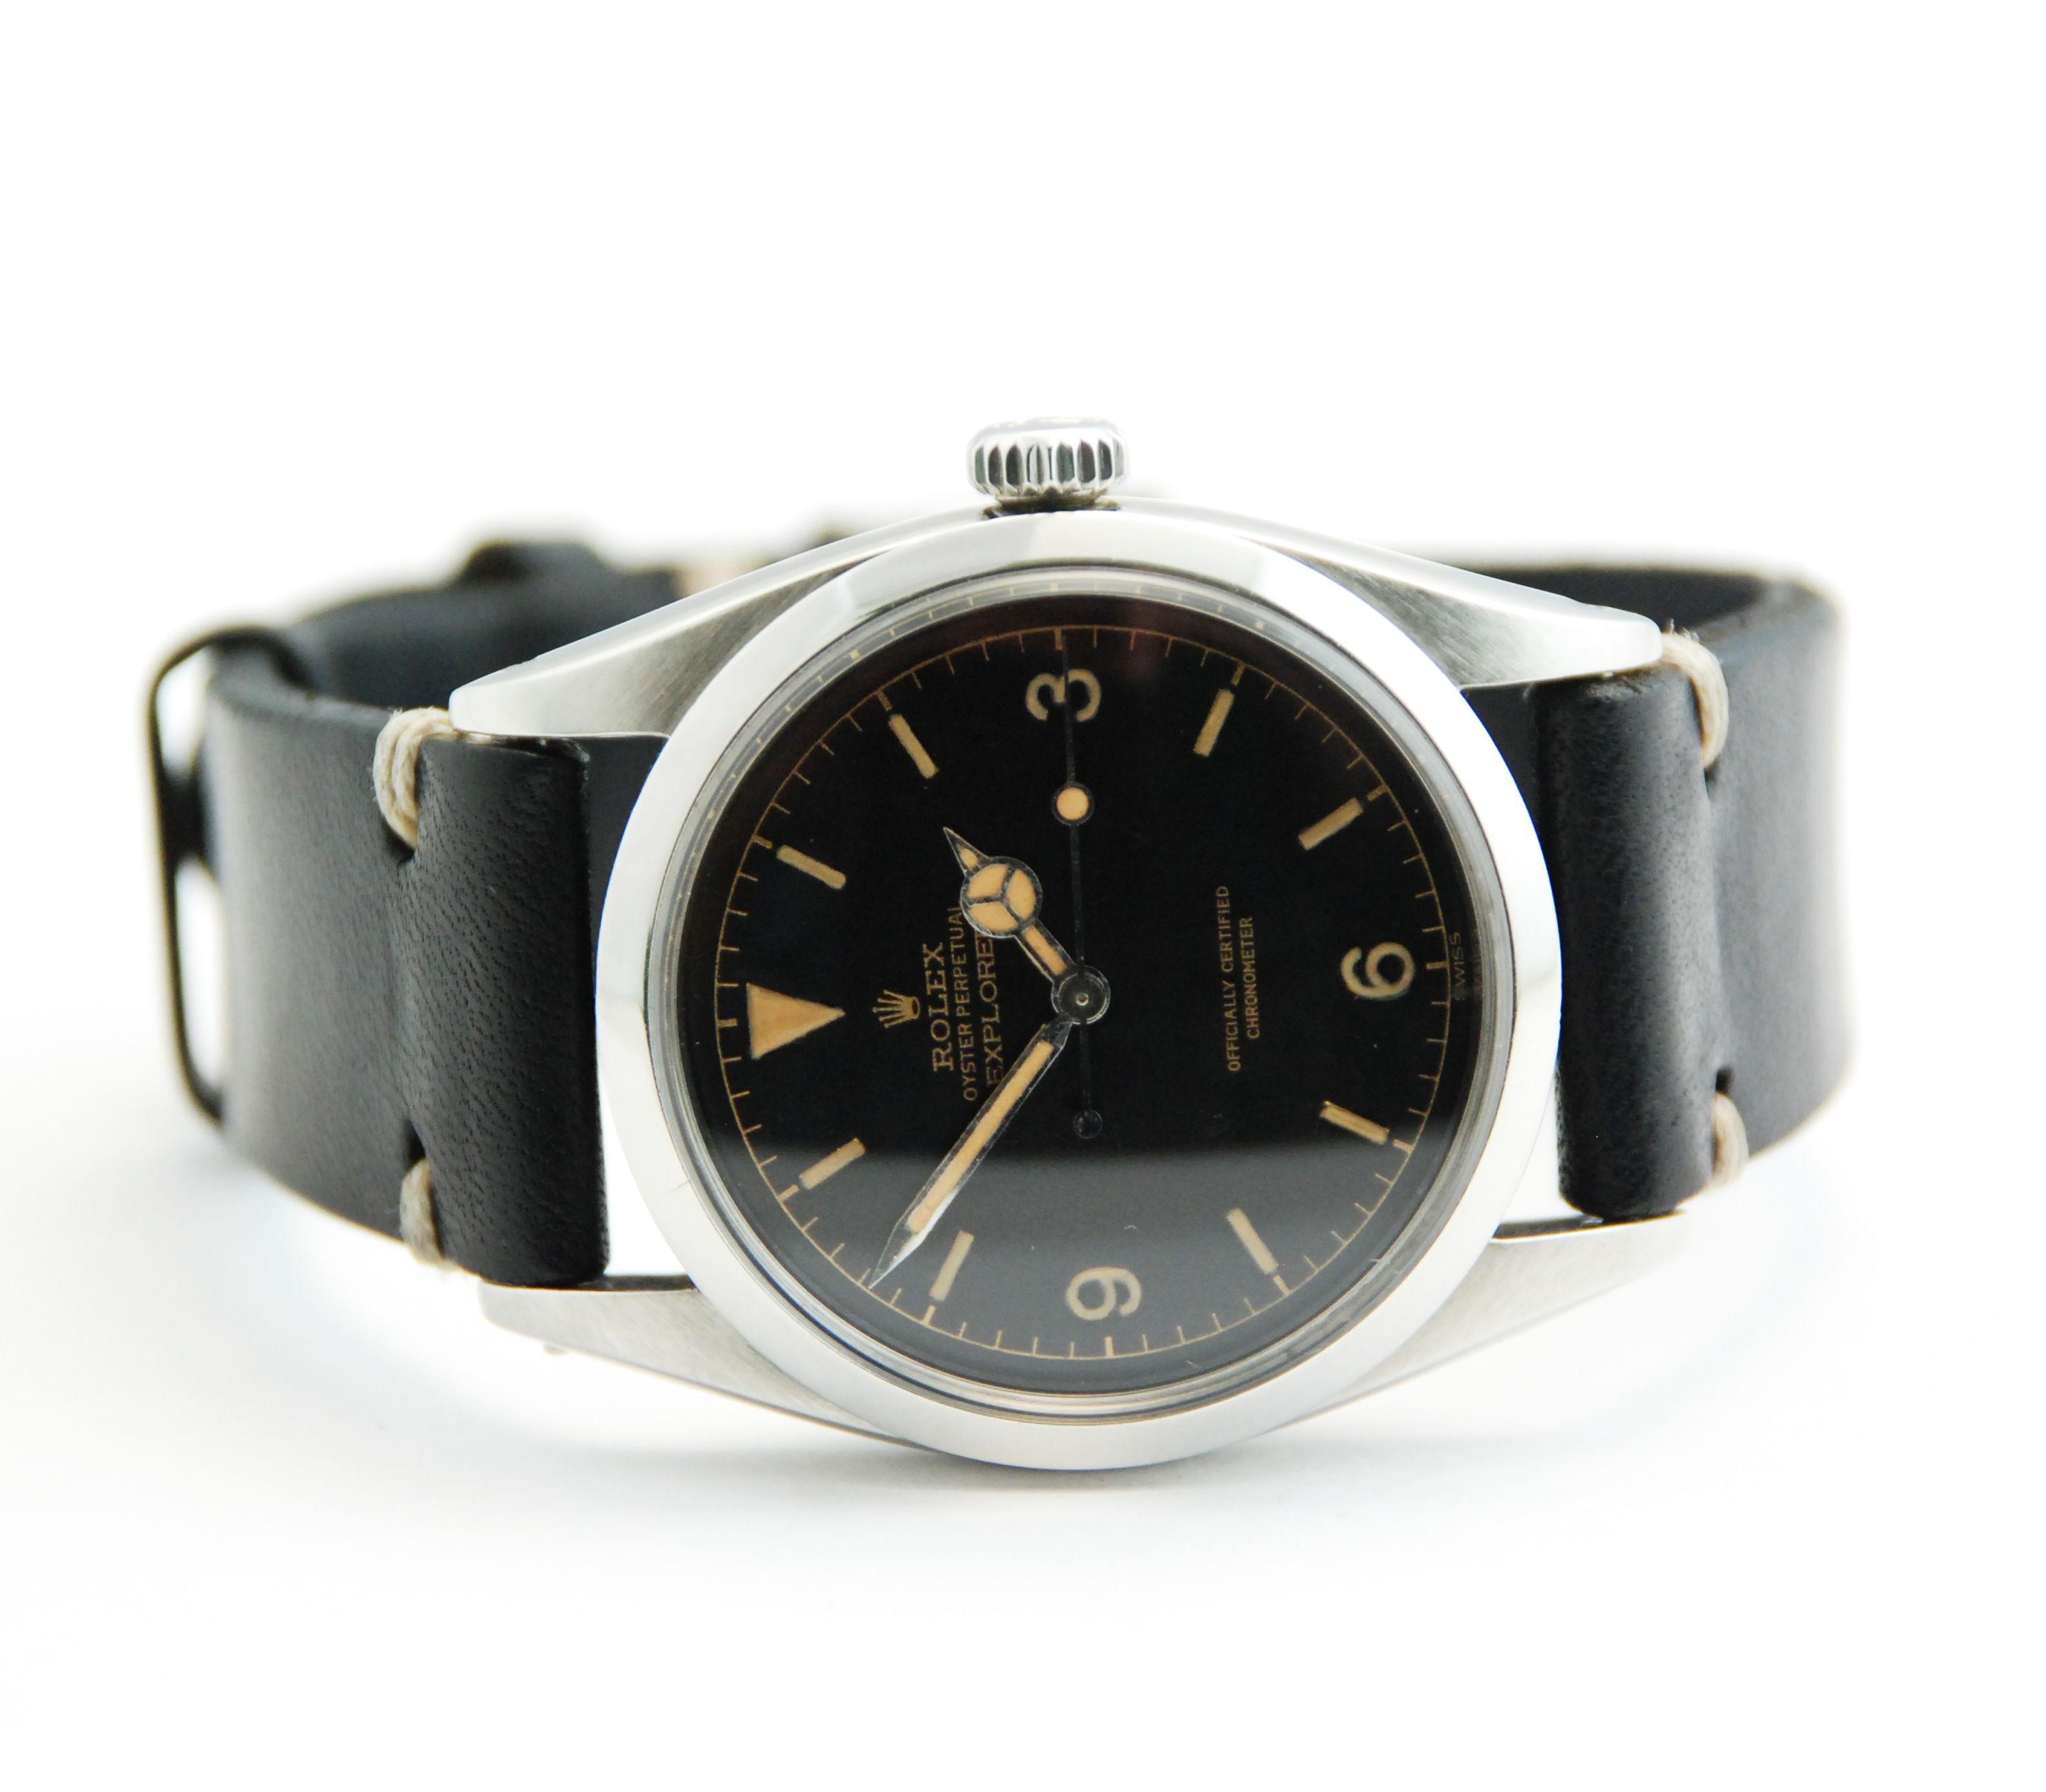 Rolex Explorer Stainless Steel Vintage w/ Black Leather